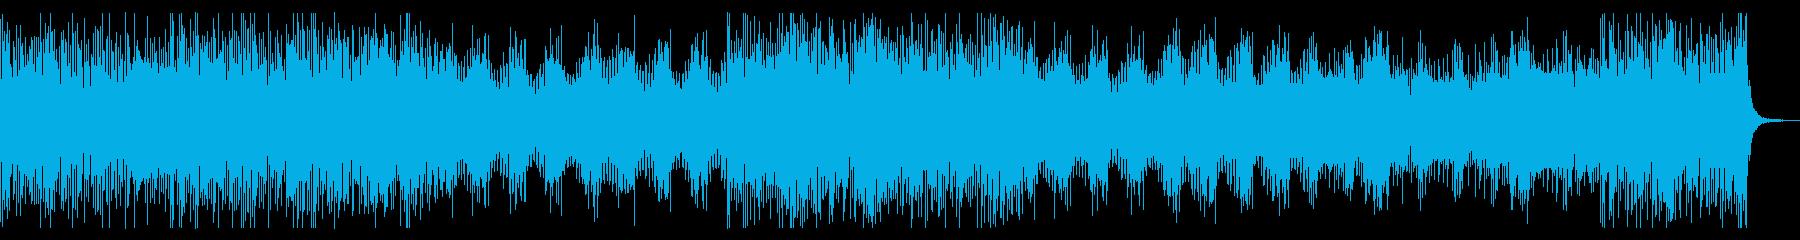 Tense Heartbeatの再生済みの波形